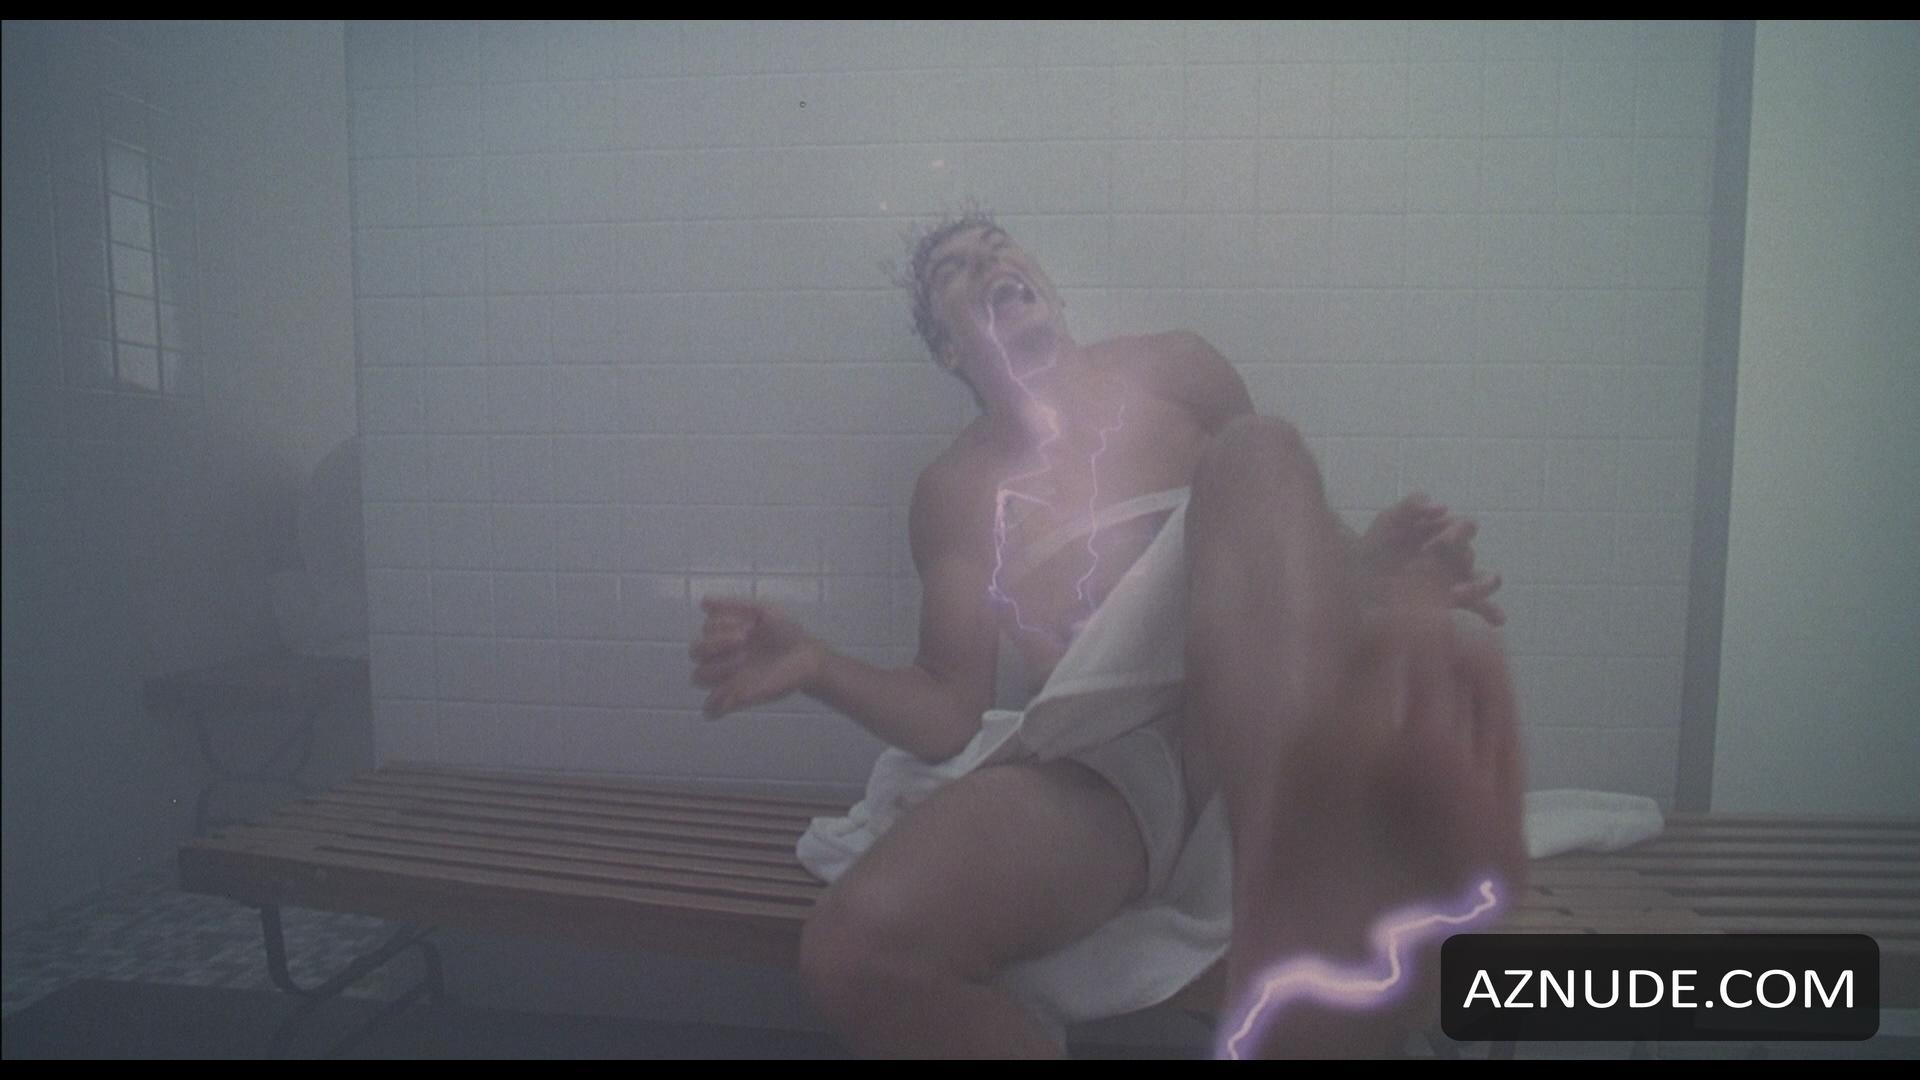 Tomcats Nude Scenes - Aznude Men-3589